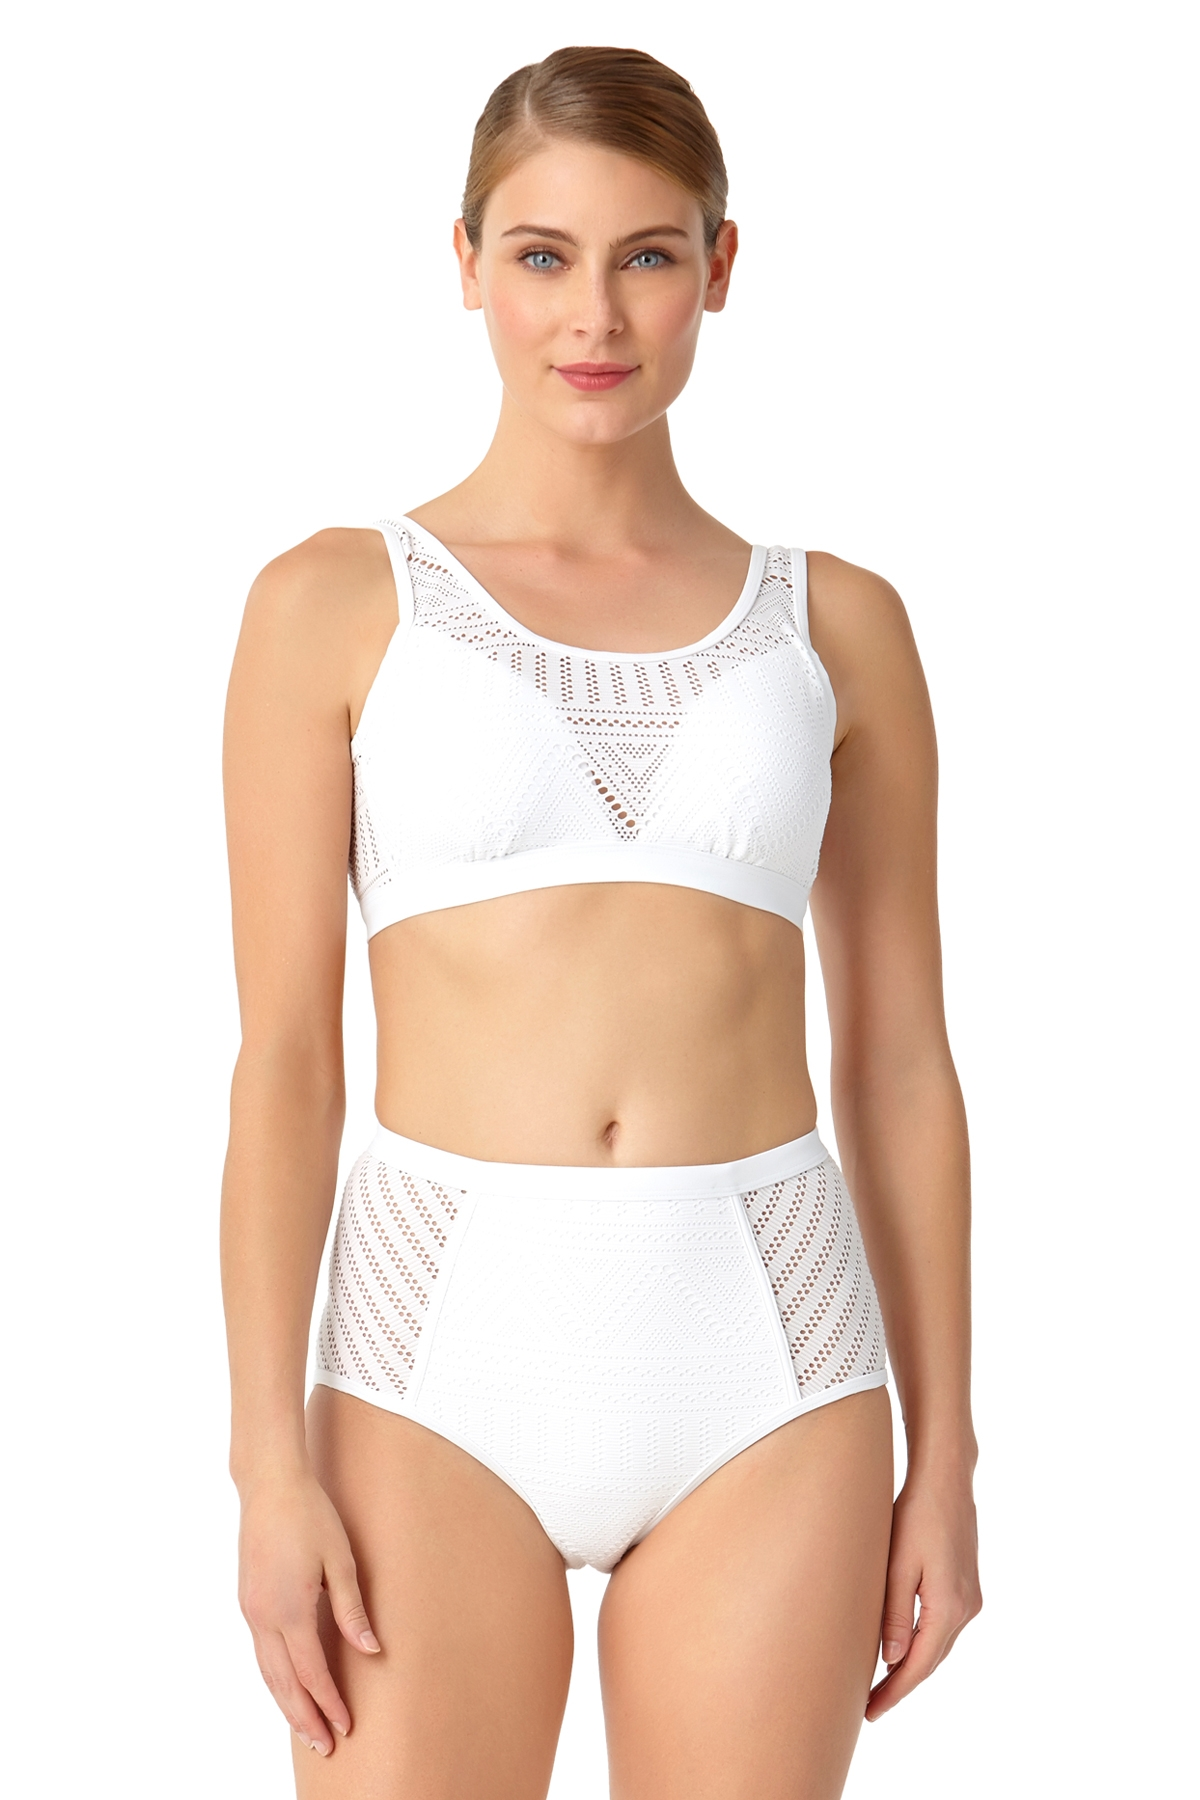 Anne Cole Women's Crochet All Day Over The Shoulder Bralette Swim Top